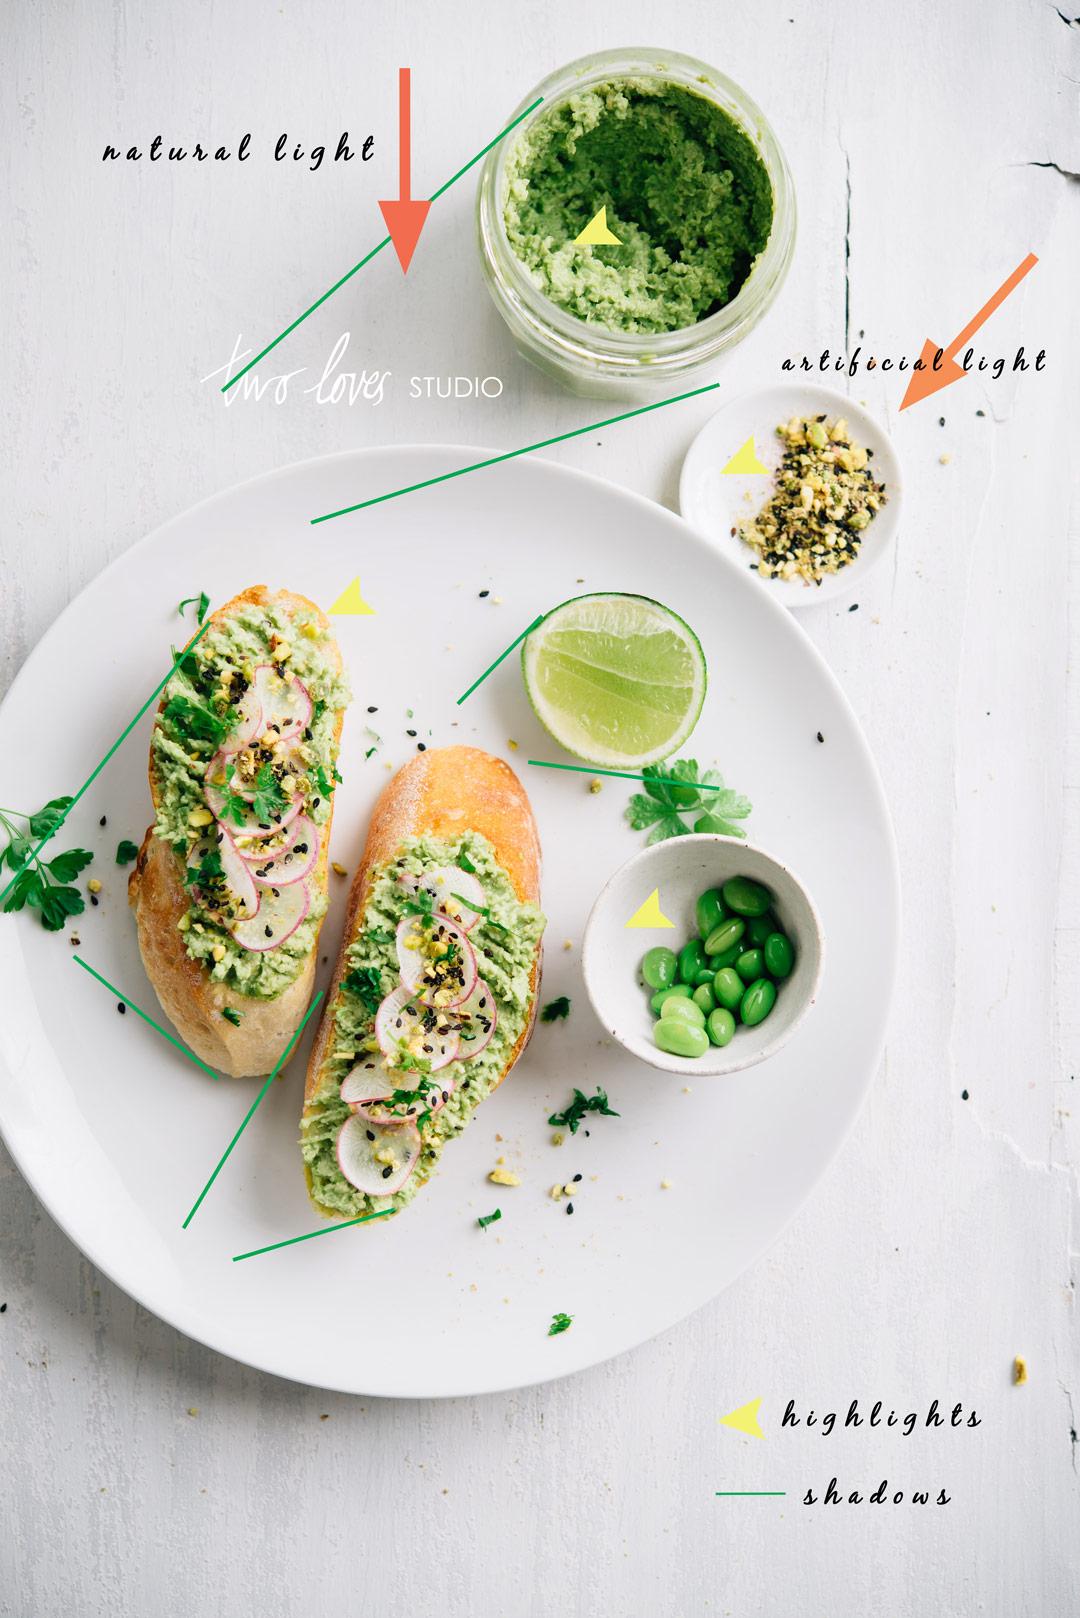 Two-Loves-Studio-Edamame-Avocado-Hummus-Toast-Mixed Lighting